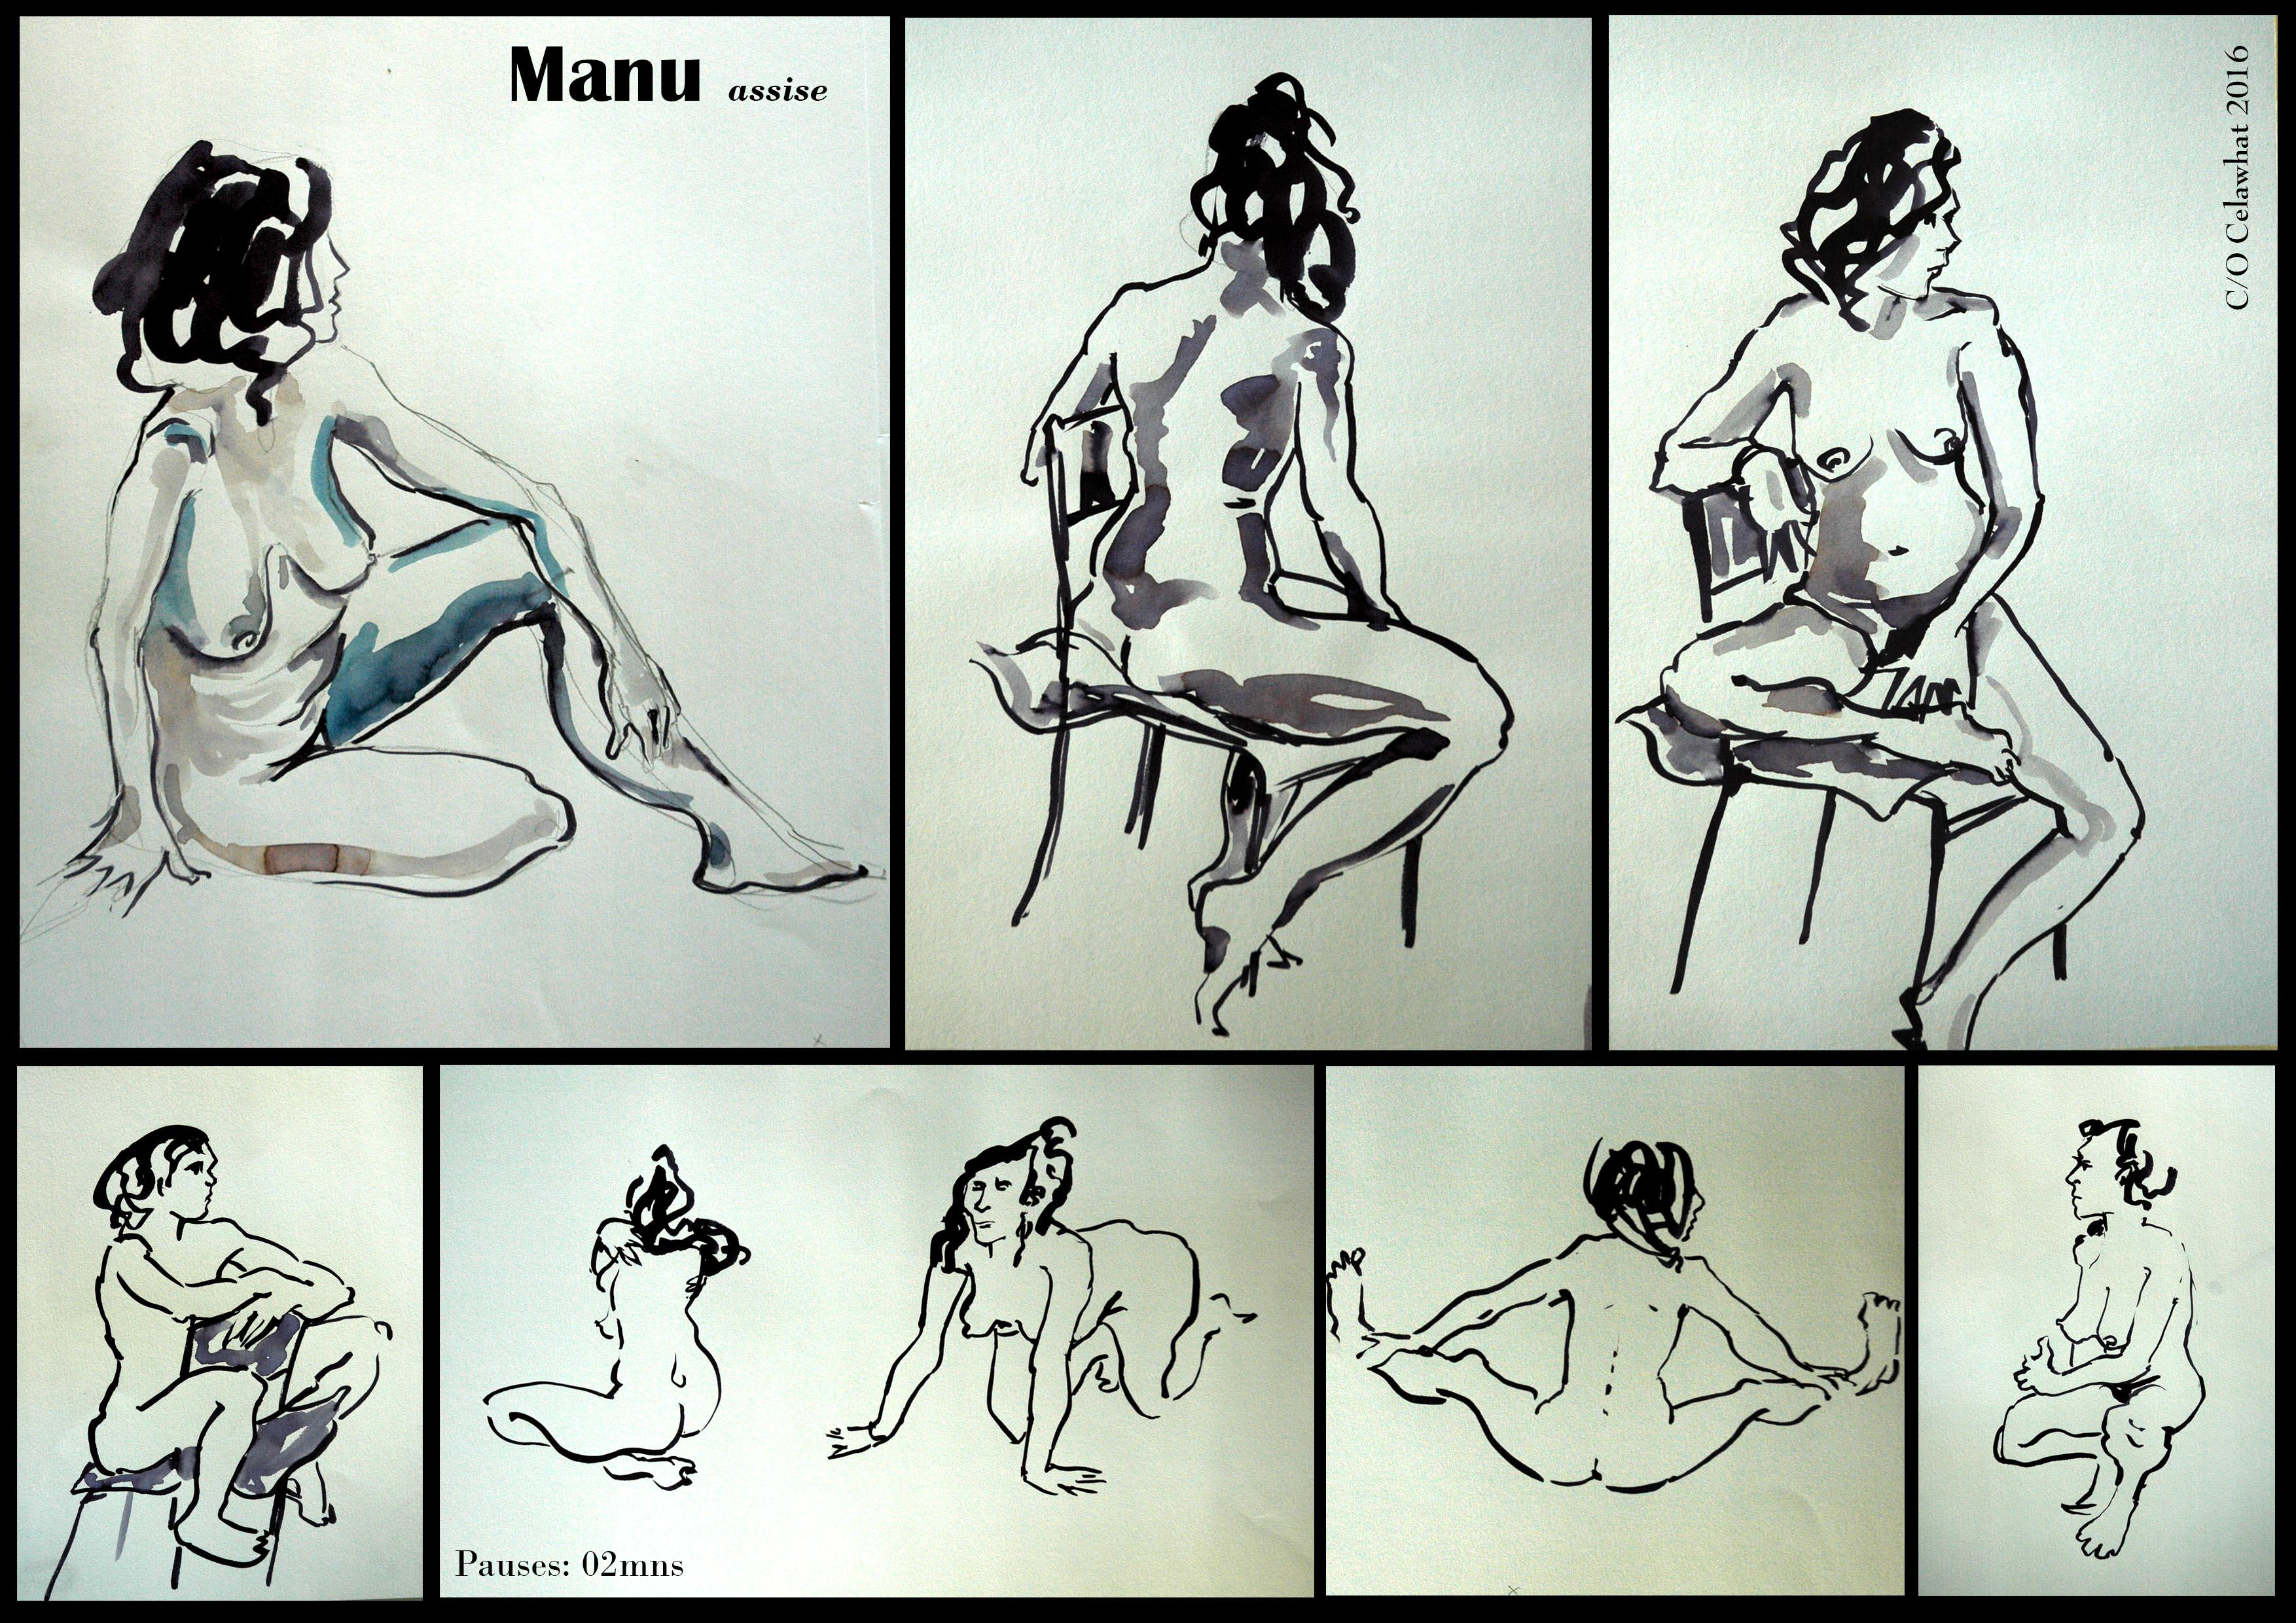 manu-assise-05